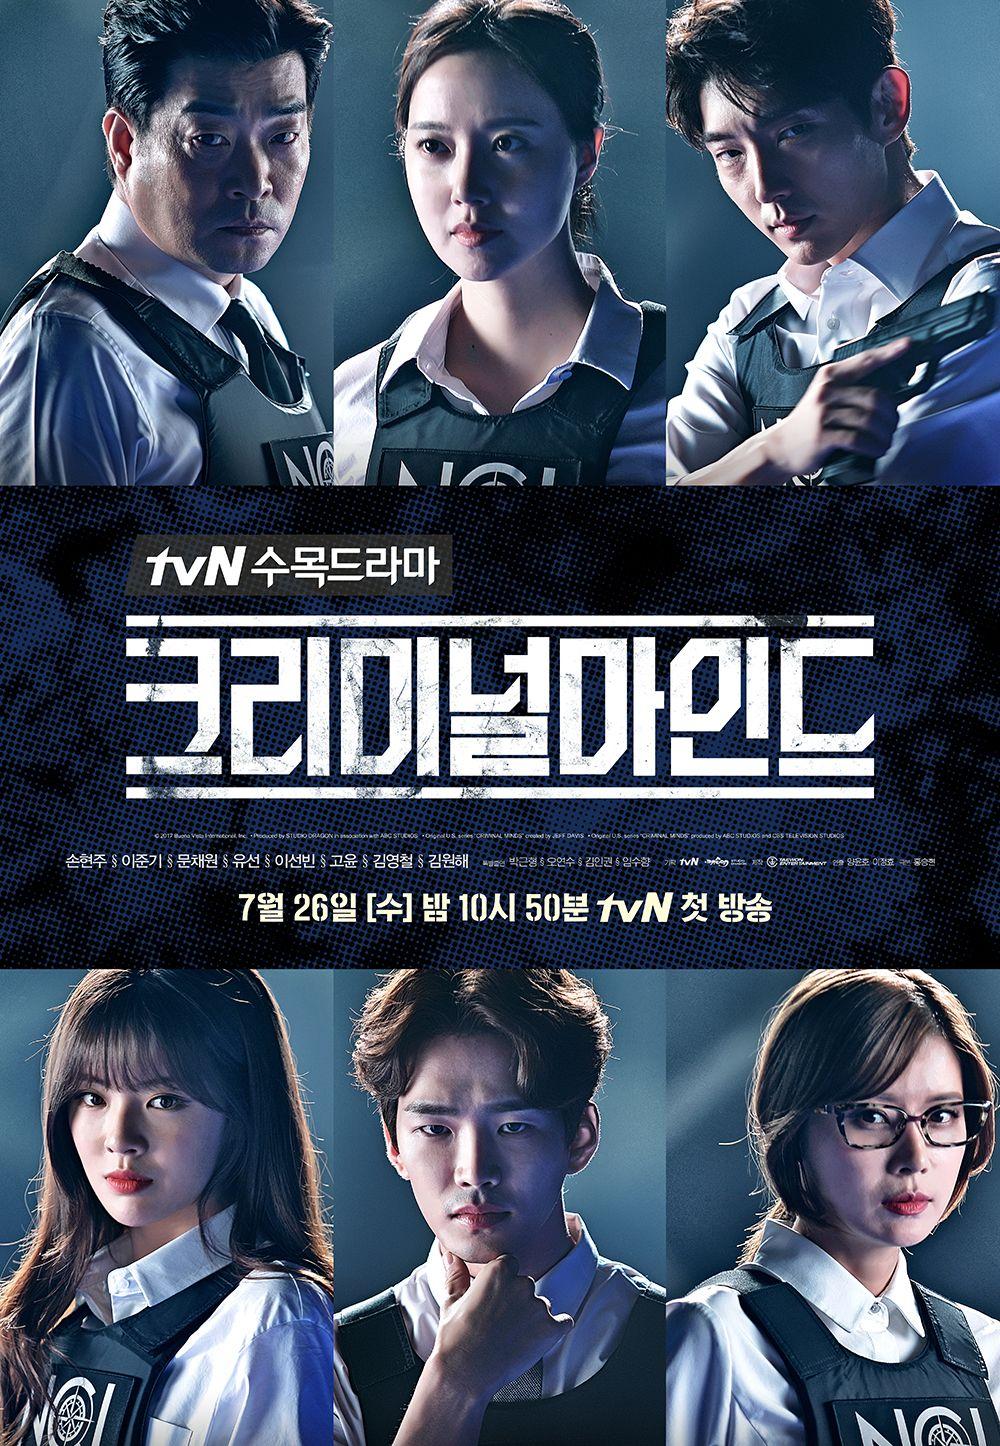 Imagini pentru Criminal Minds poster drama